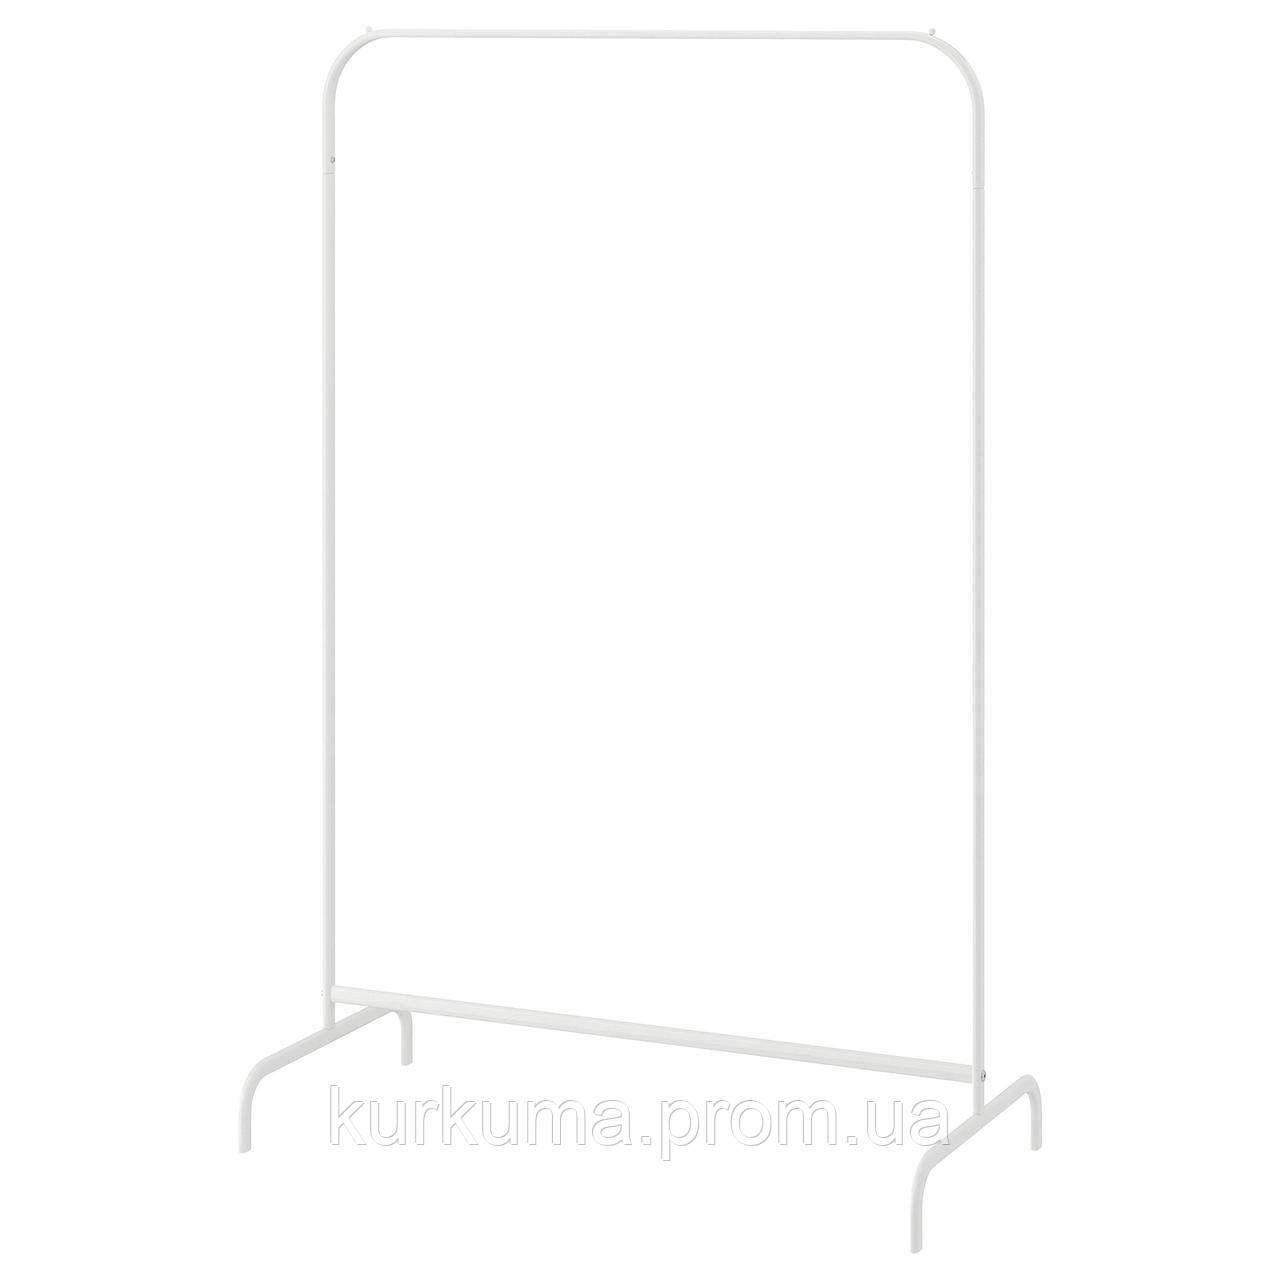 IKEA MULIG Вешалка для одежды, белый  (601.794.34)